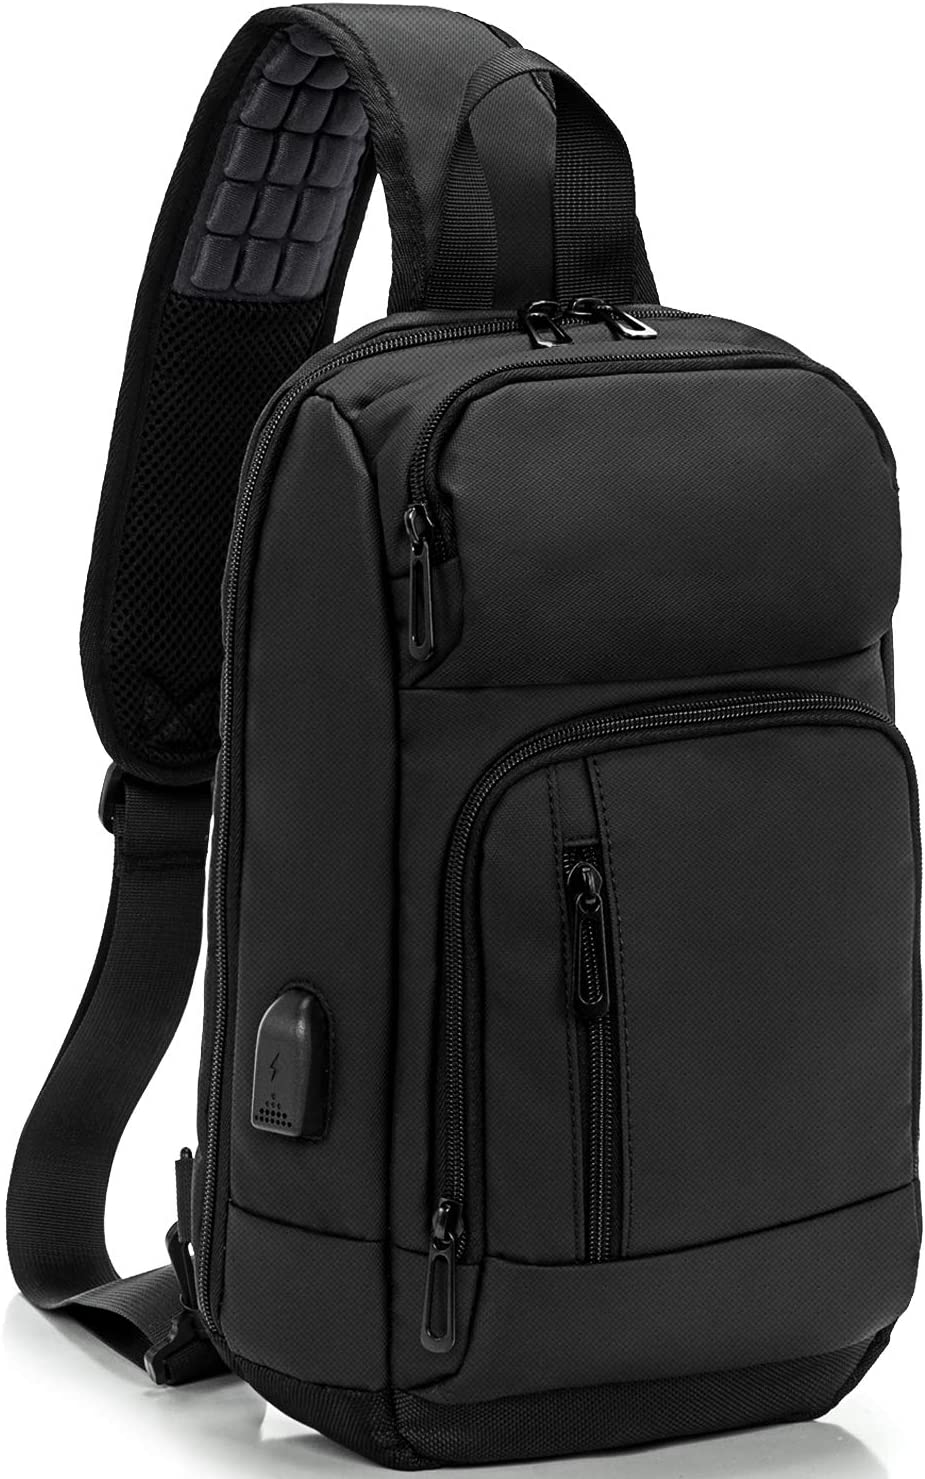 KINGSLONG Waterproof Sling Backpack Bag Selling for Men C online shop with USB Women